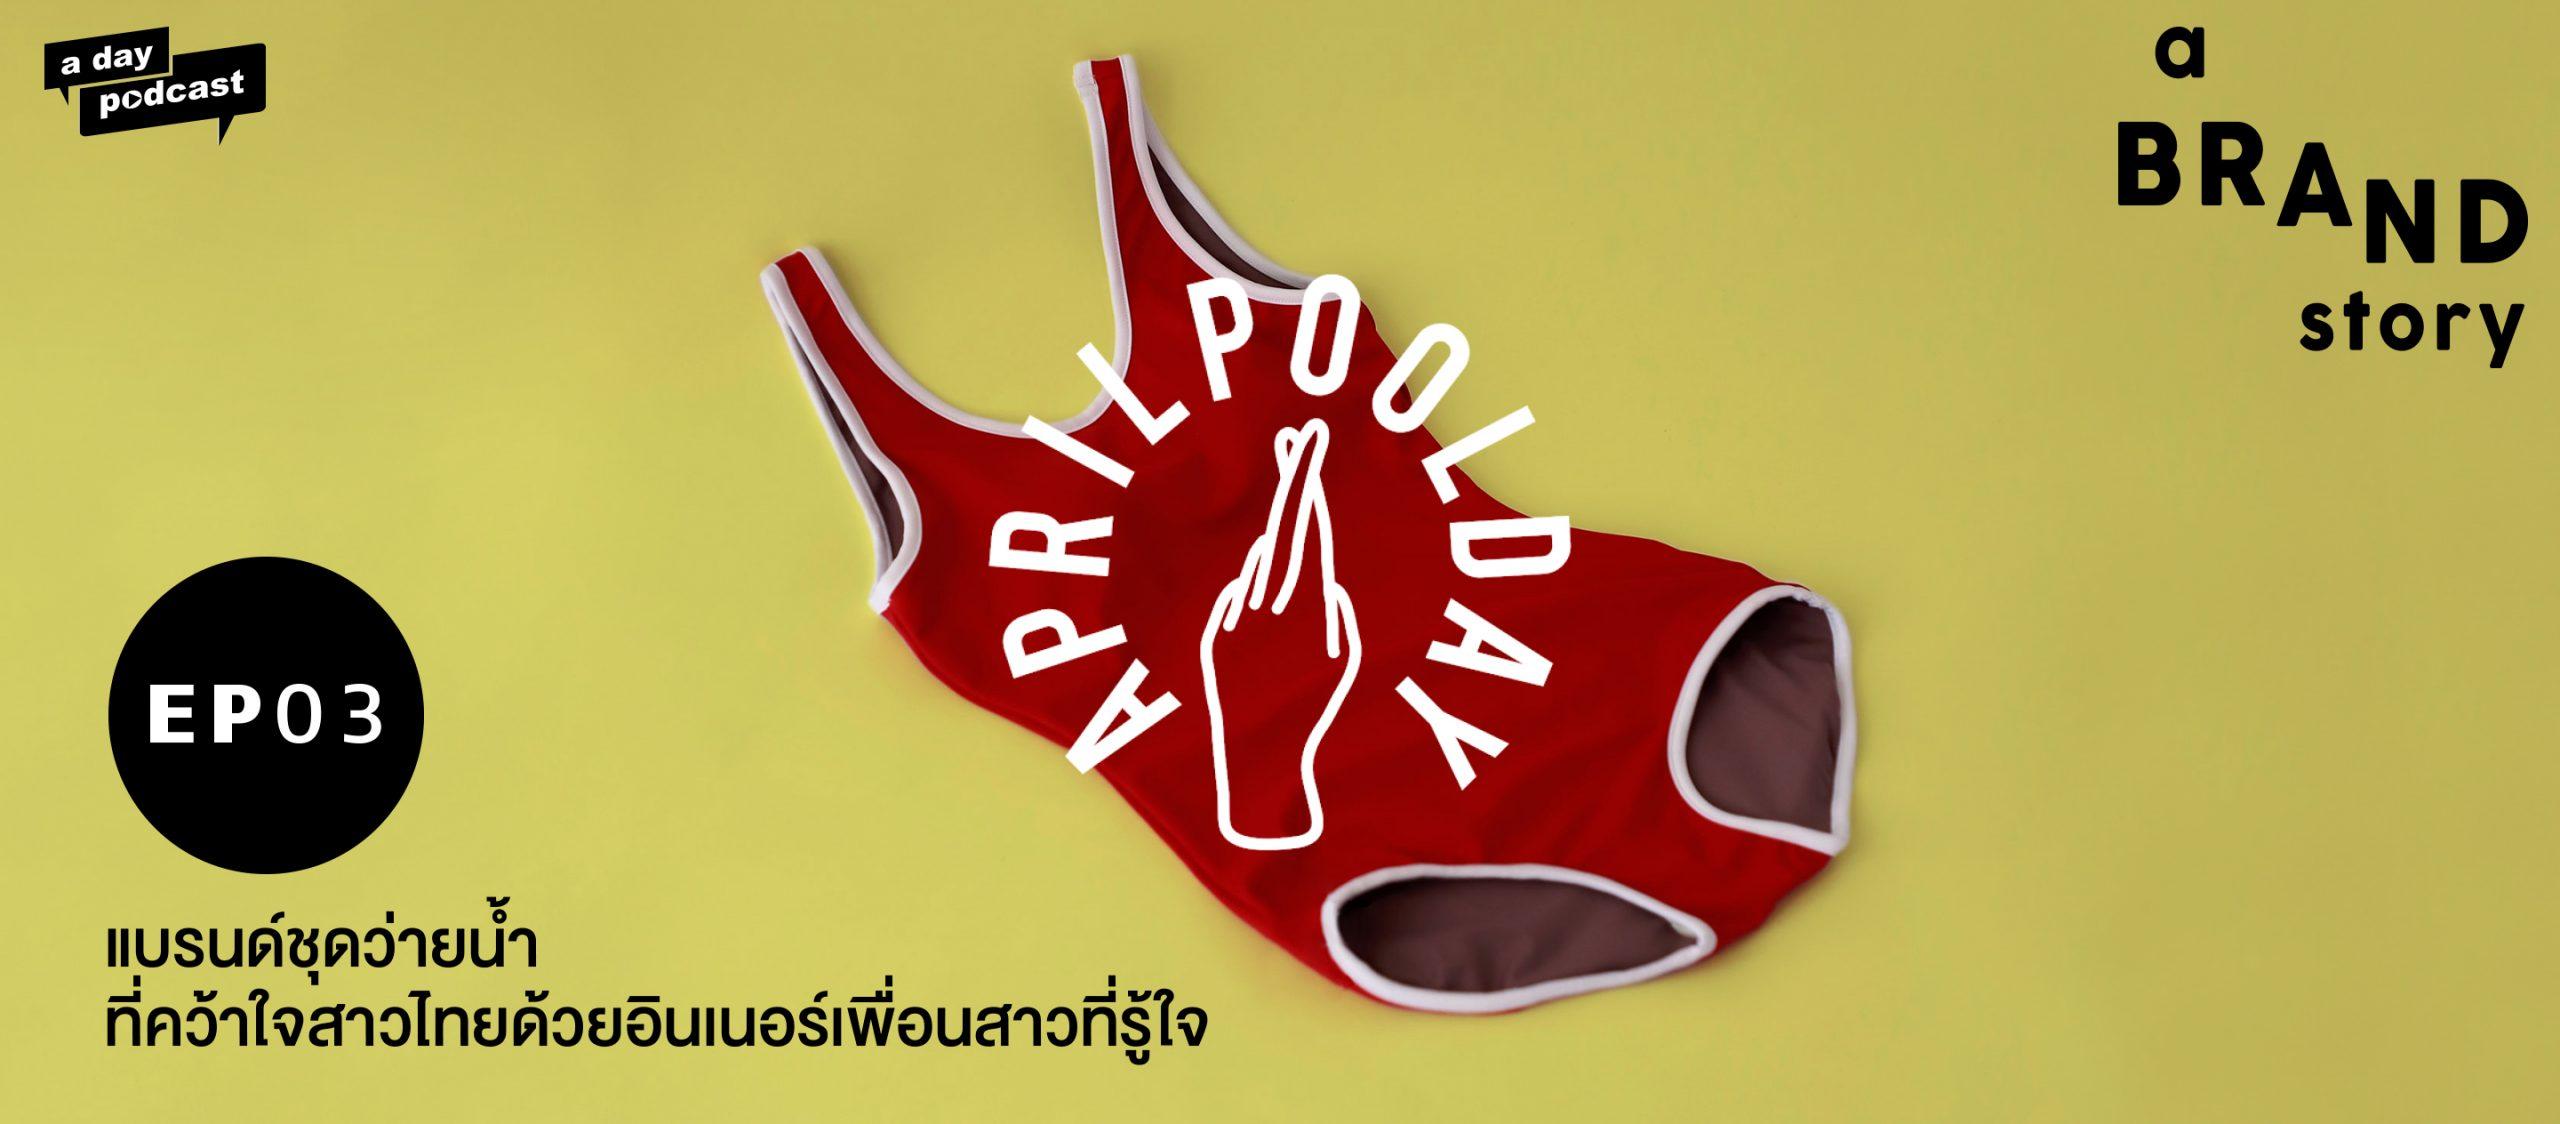 a BRAND story EP.03 Aprilpoolday แบรนด์ชุดว่ายน้ำที่คว้าใจสาวไทยด้วยอินเนอร์เพื่อนสาวที่รู้ใจ